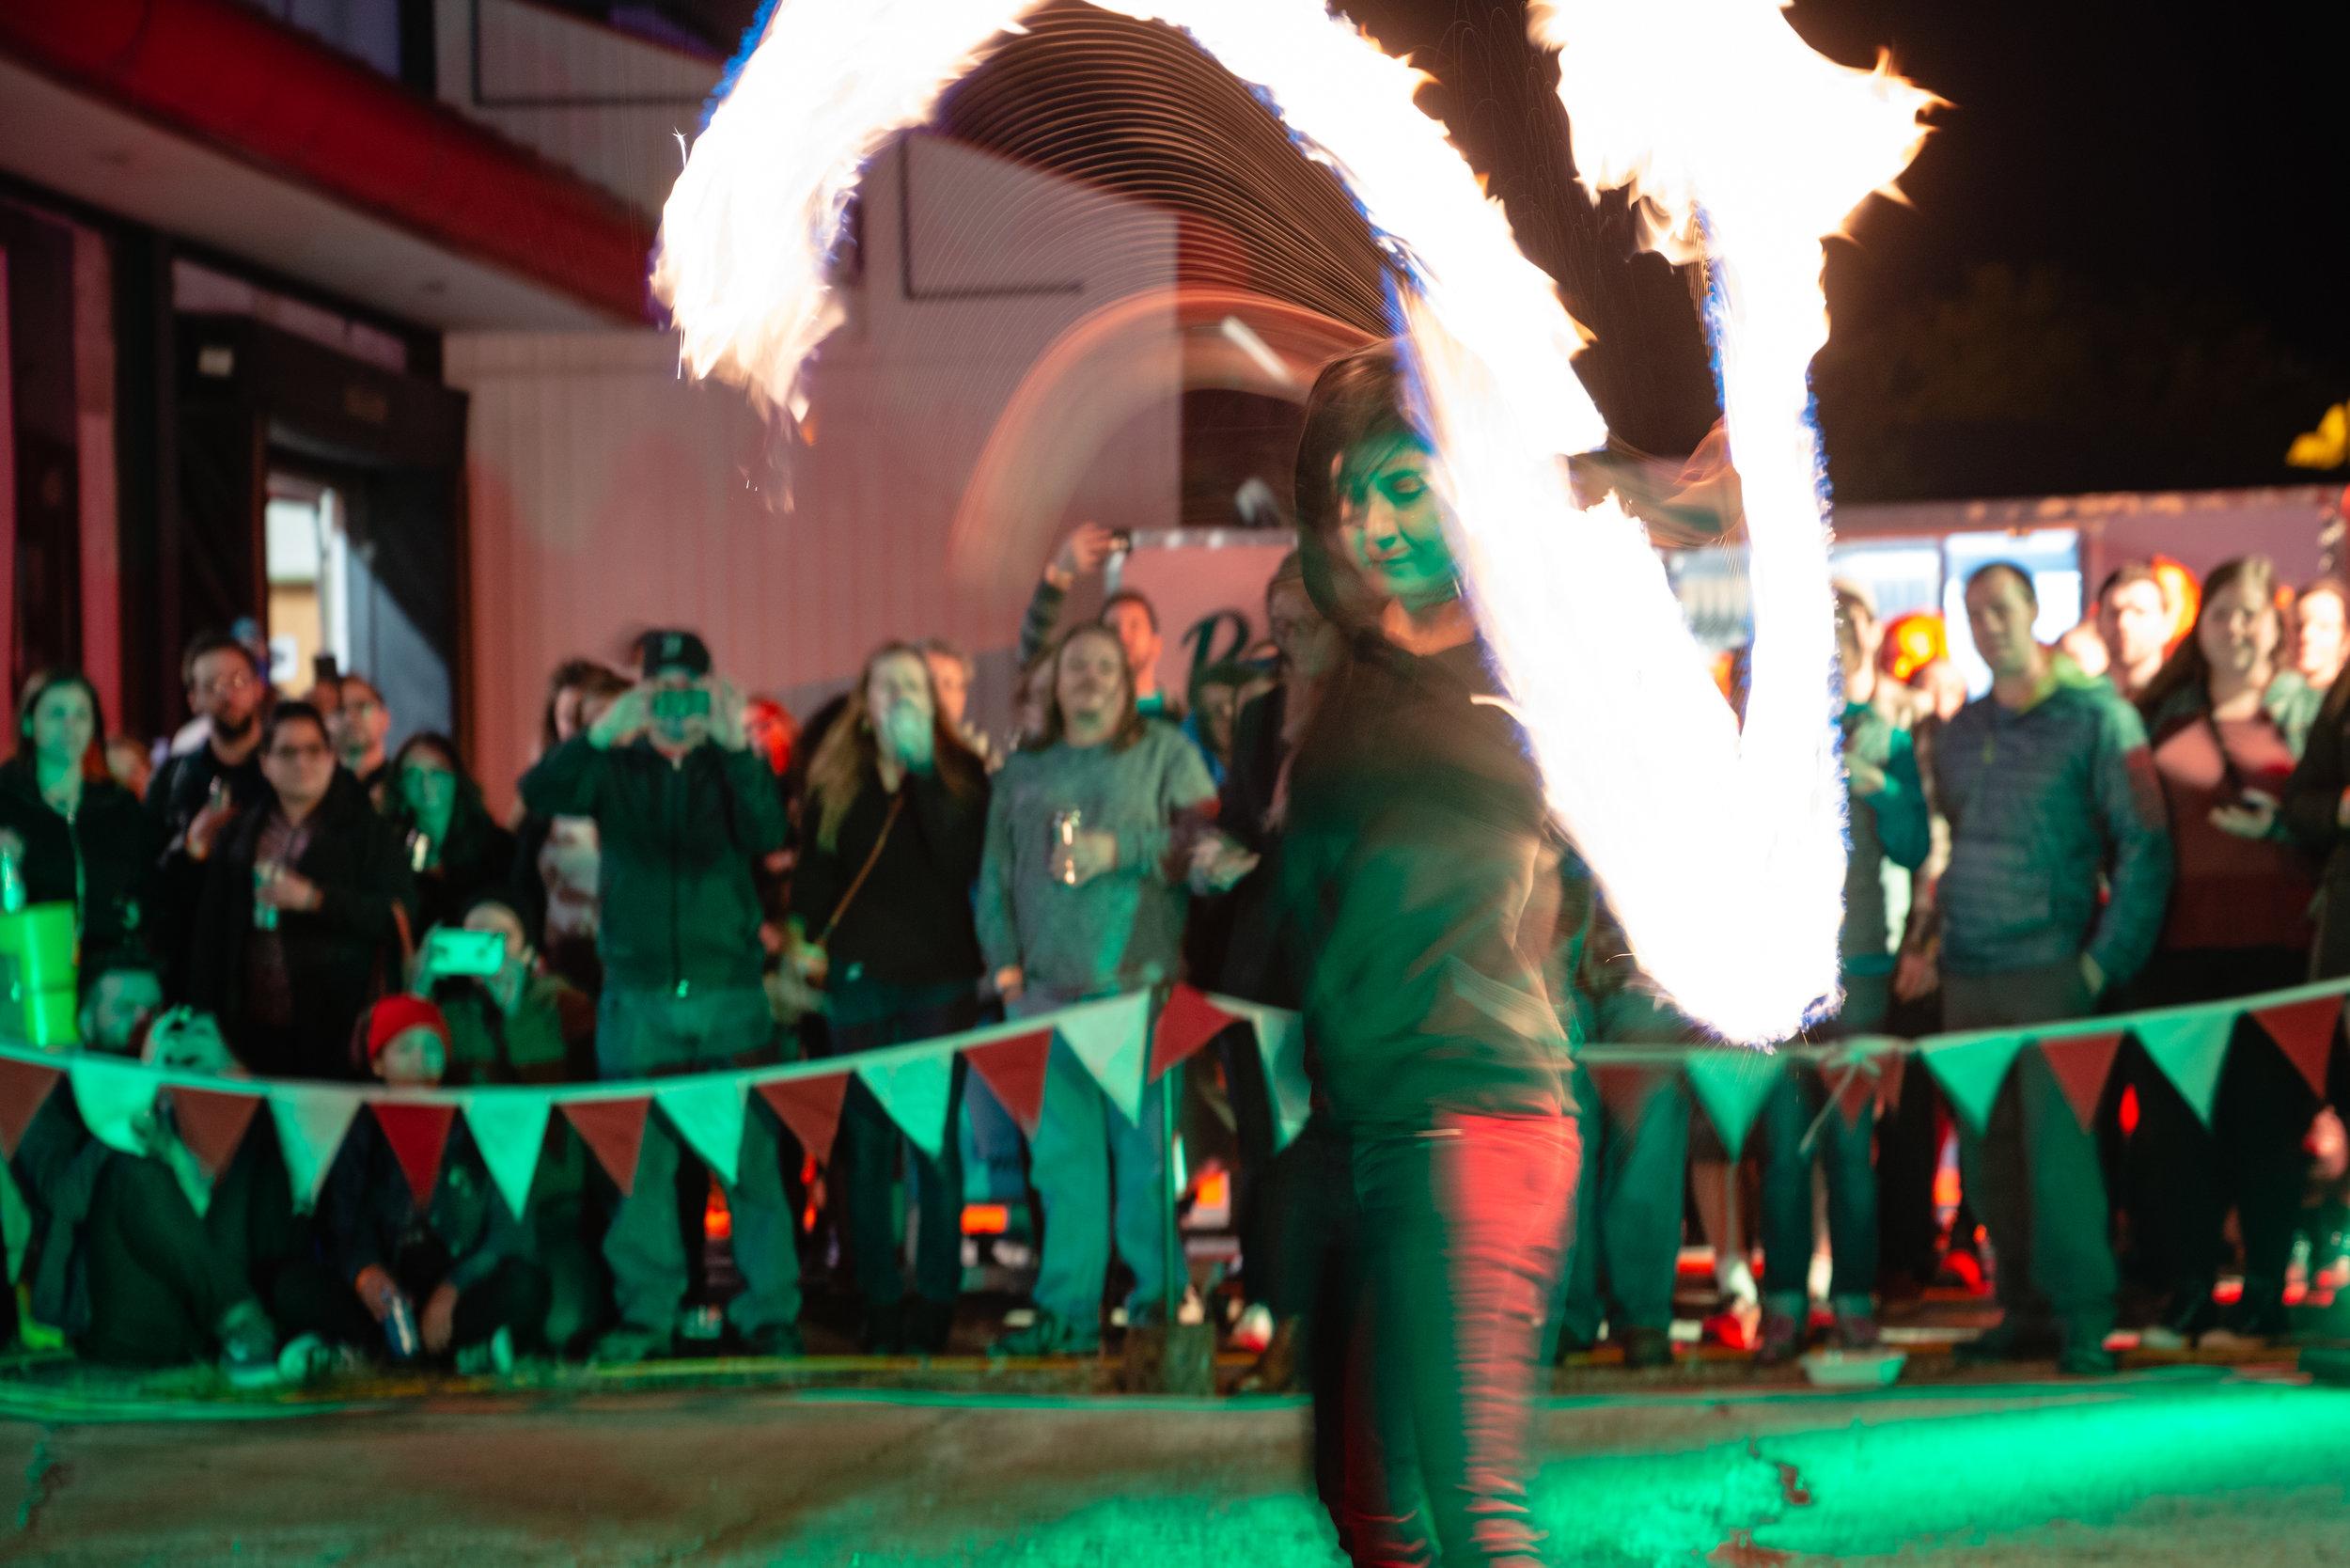 Flynn on Fire Fest at Switchback - Kyle Tansley (66 of 81).jpg